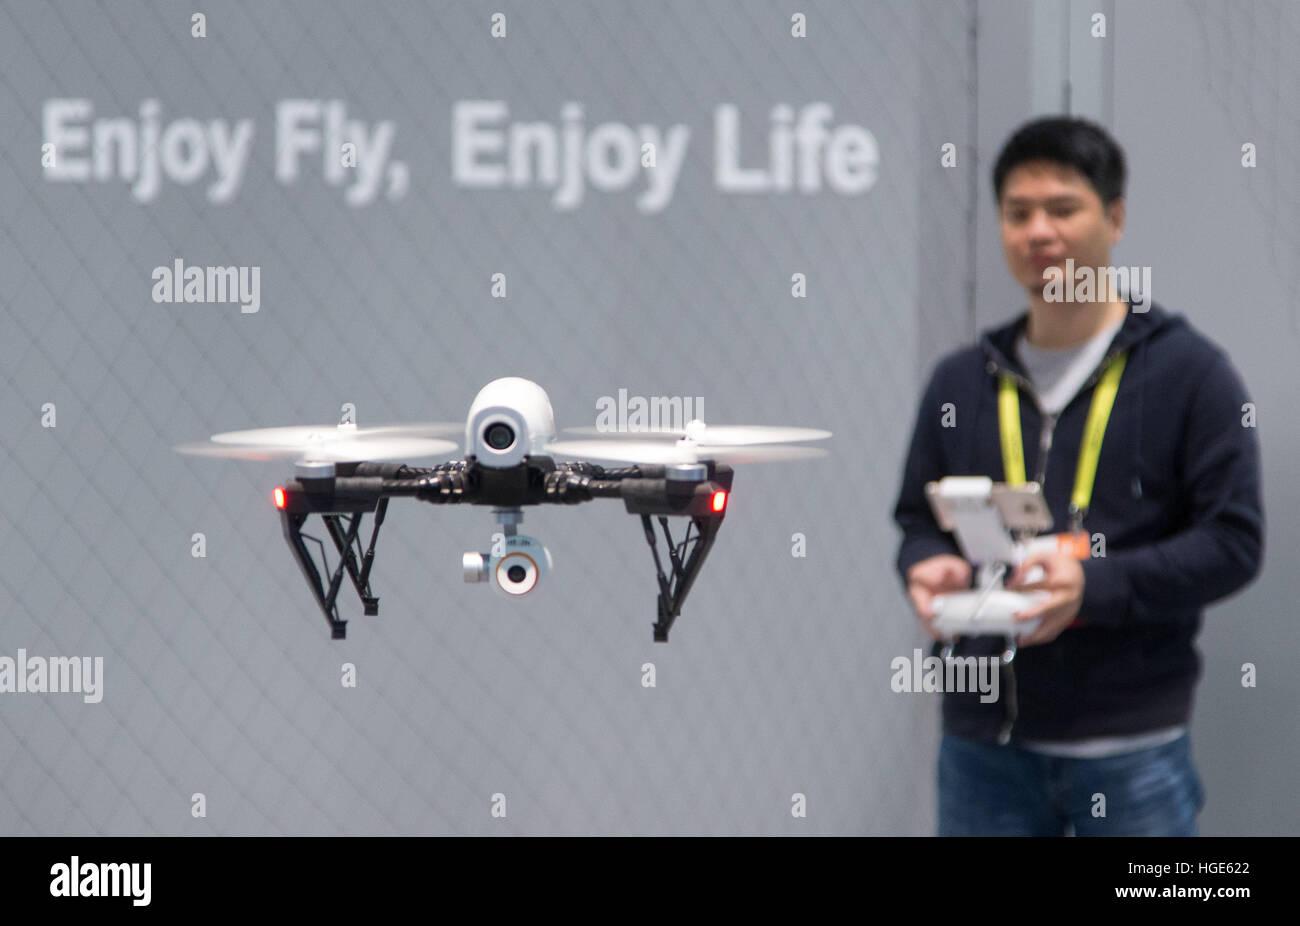 Las Vegas, USA. 6. Januar 2017. 6. Januar 2017 wird eine ferngesteuerte Drohne auf der CES-Technologiemesse in Las Stockbild